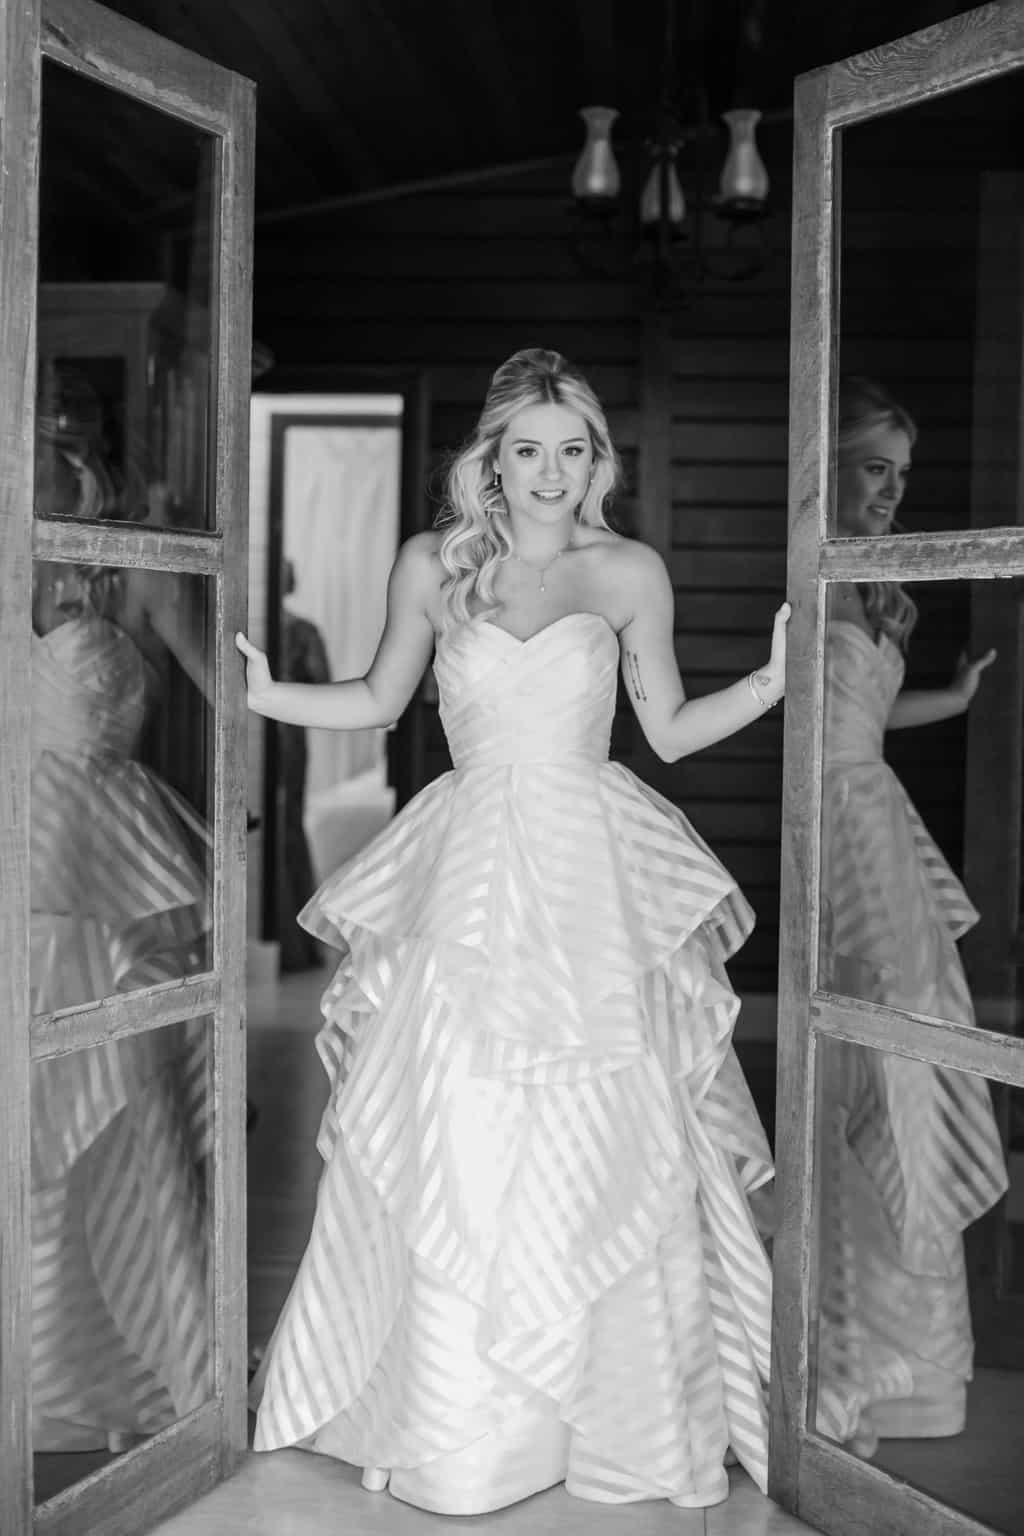 Casamento-Milene-e-Leonardo-decoracao-da-festa-making-of-Roberto-Tamer-terras-claras-vestido-de-noiva104